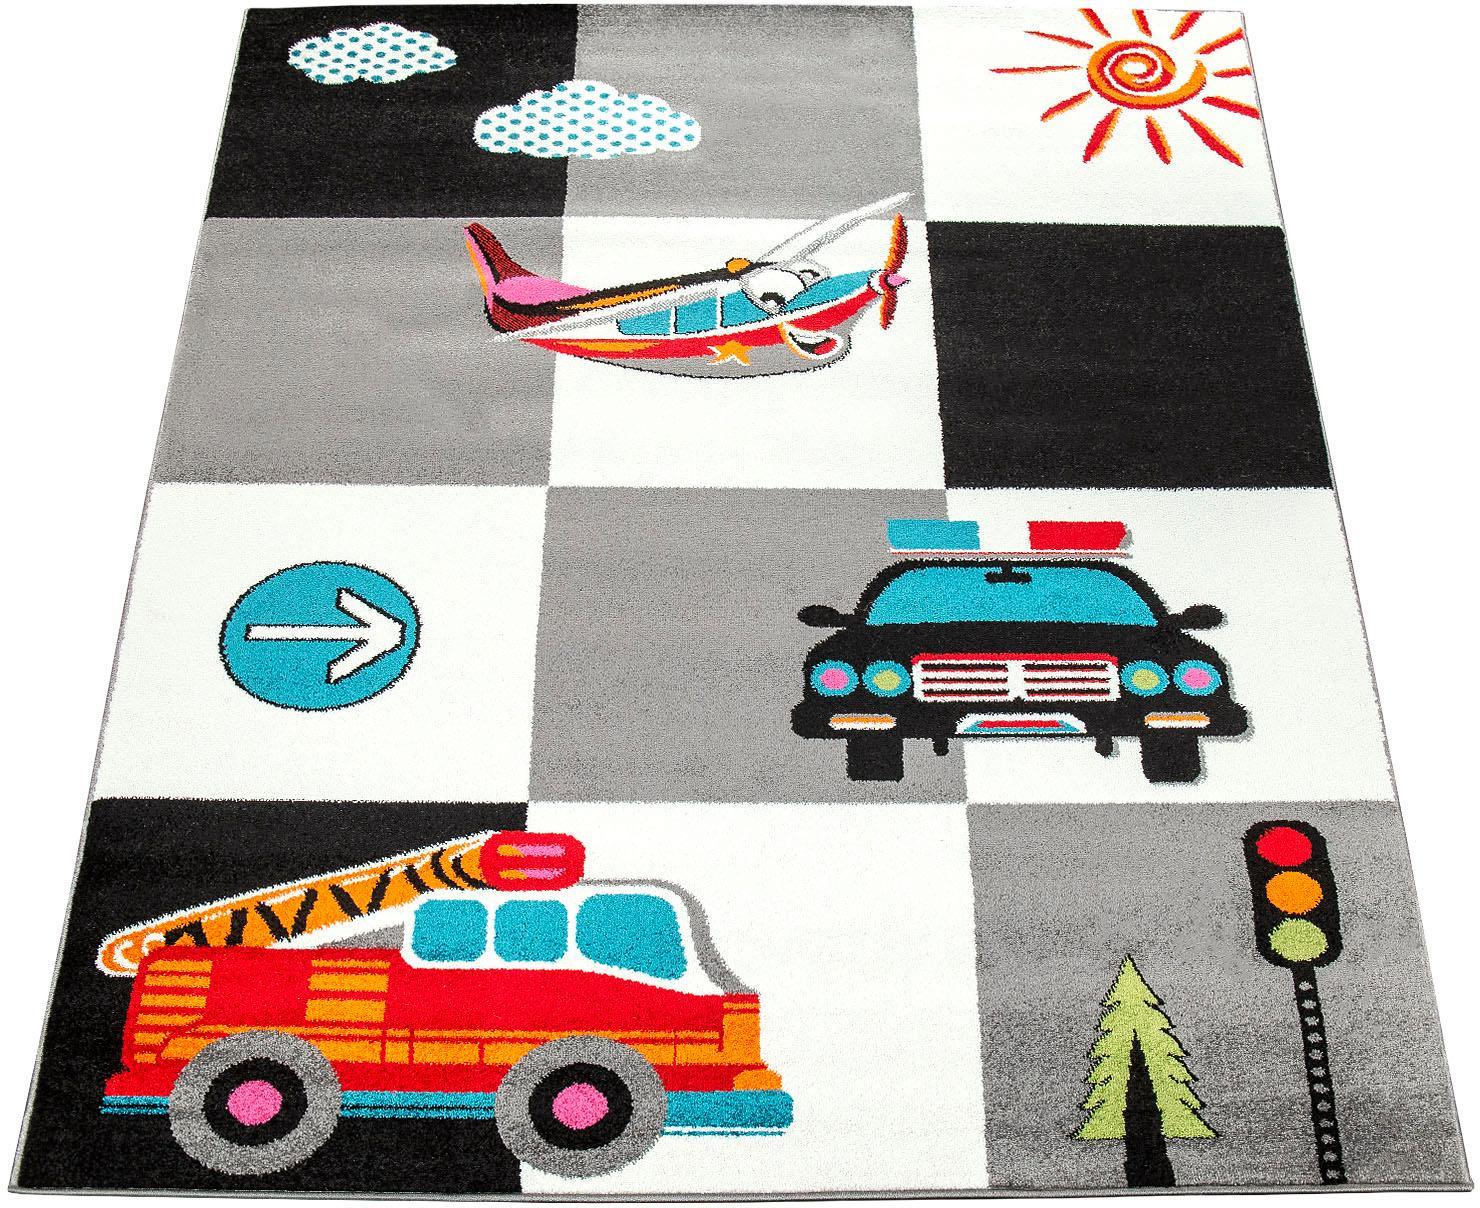 Paco Home Kinderteppich ECE 998, rechteckig, 14 mm Höhe, Kurzflor mit Verkehrsmittel Motiven, Kinderzimmer grau Kinder Bunte Kinderteppiche Teppiche